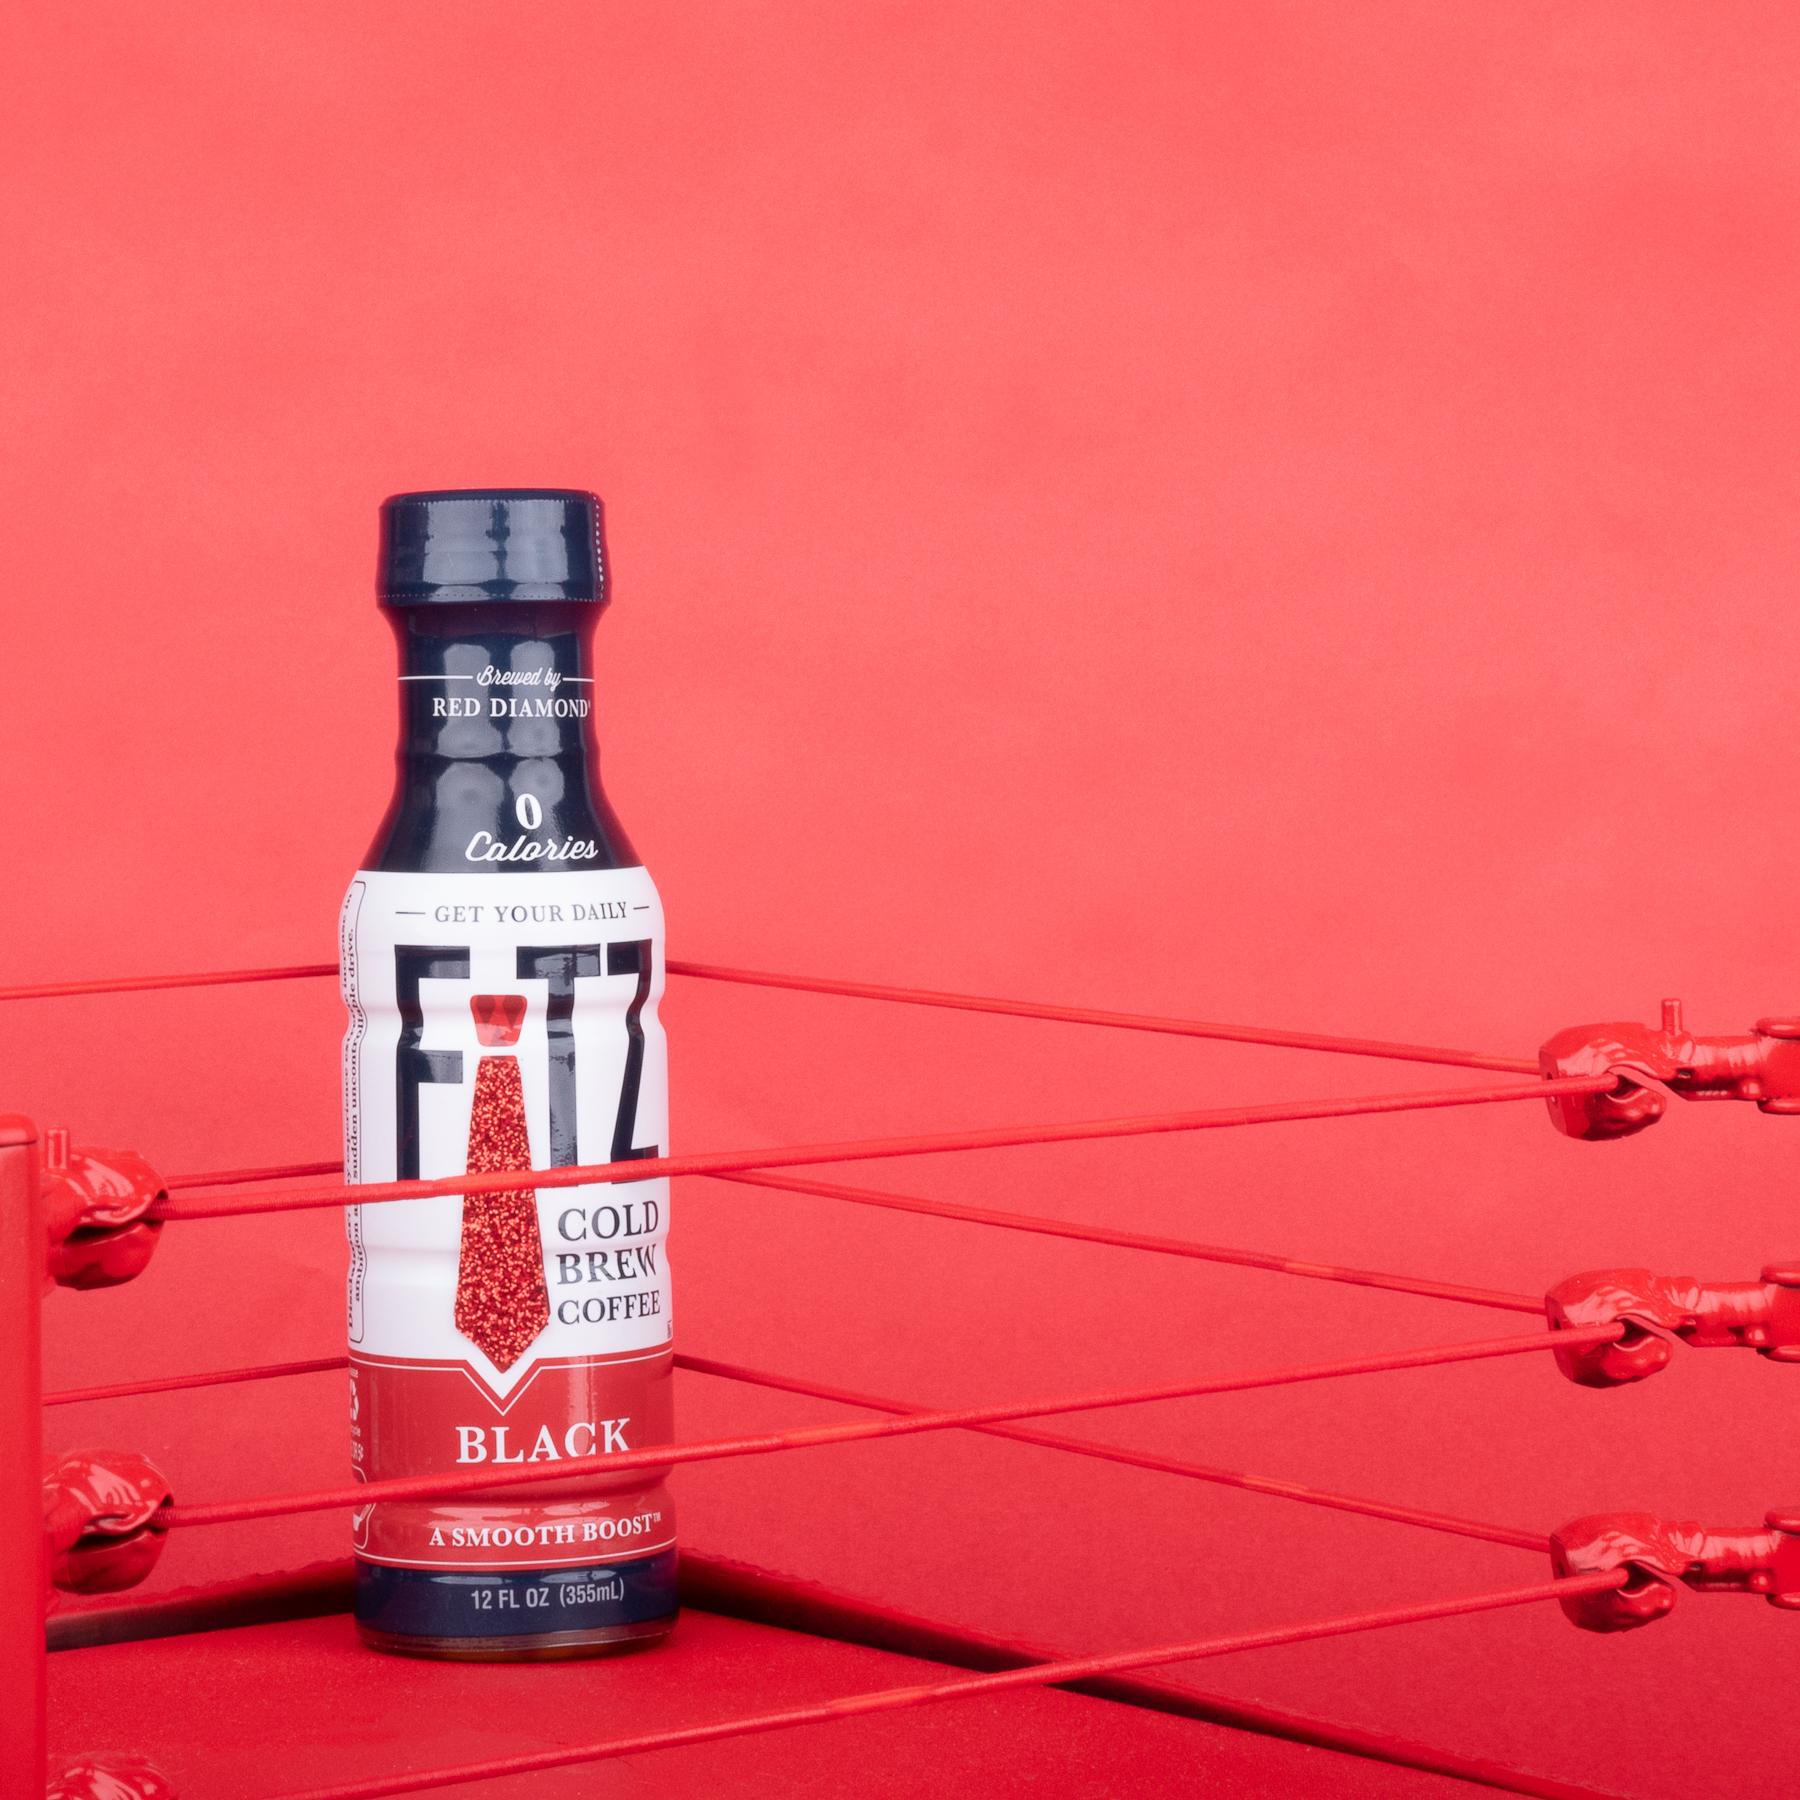 Fitz-Inthiscornerat12ounces.jpg